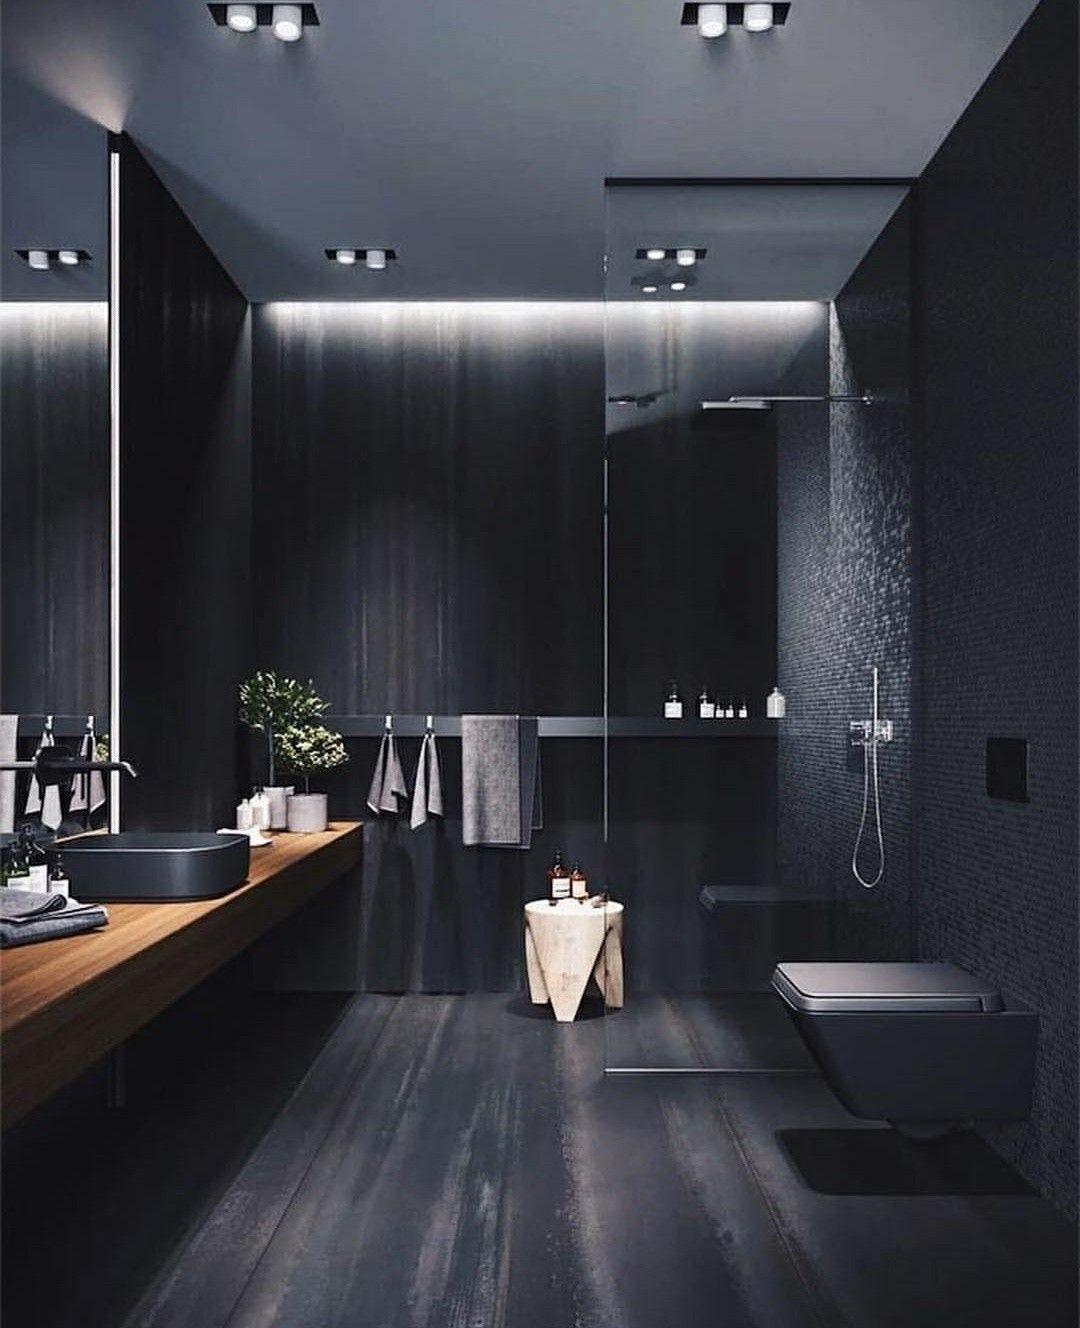 Gaste Wc Armaturen Bad Badezimmer Design Dunkle Badezimmer